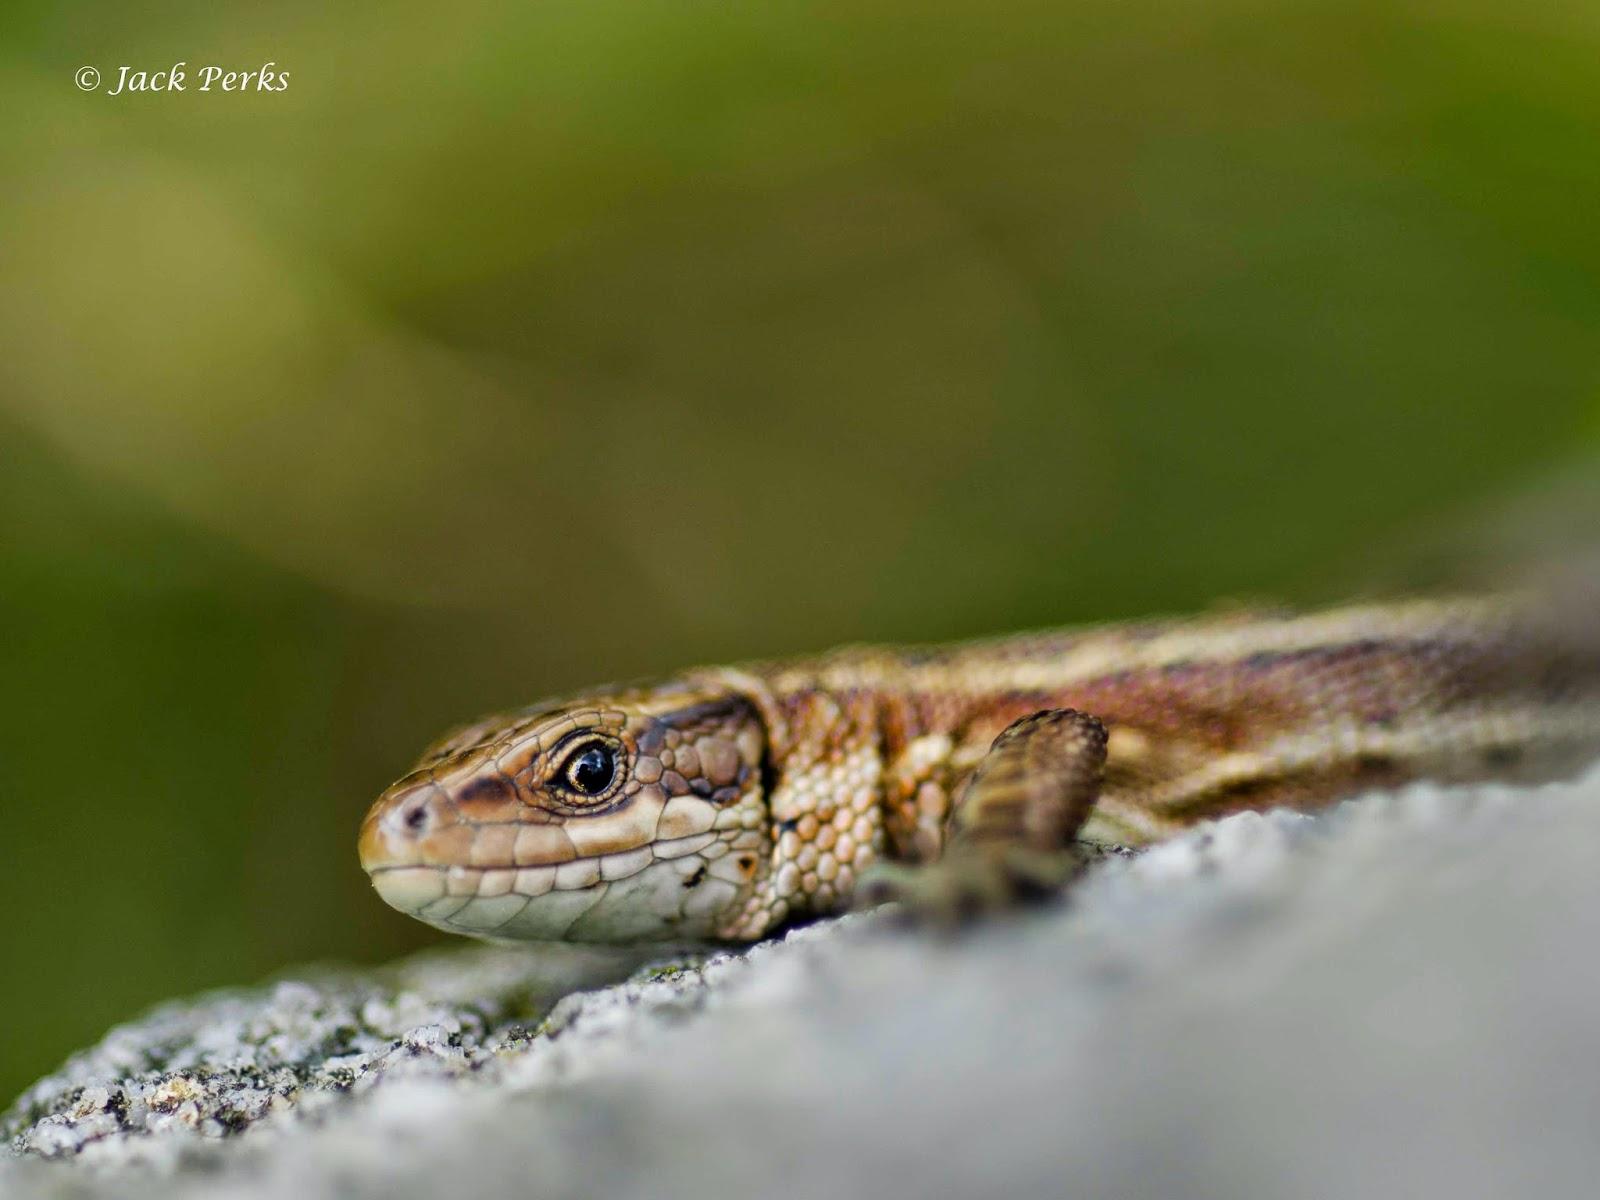 U S Lizard Jack Perks Phot...